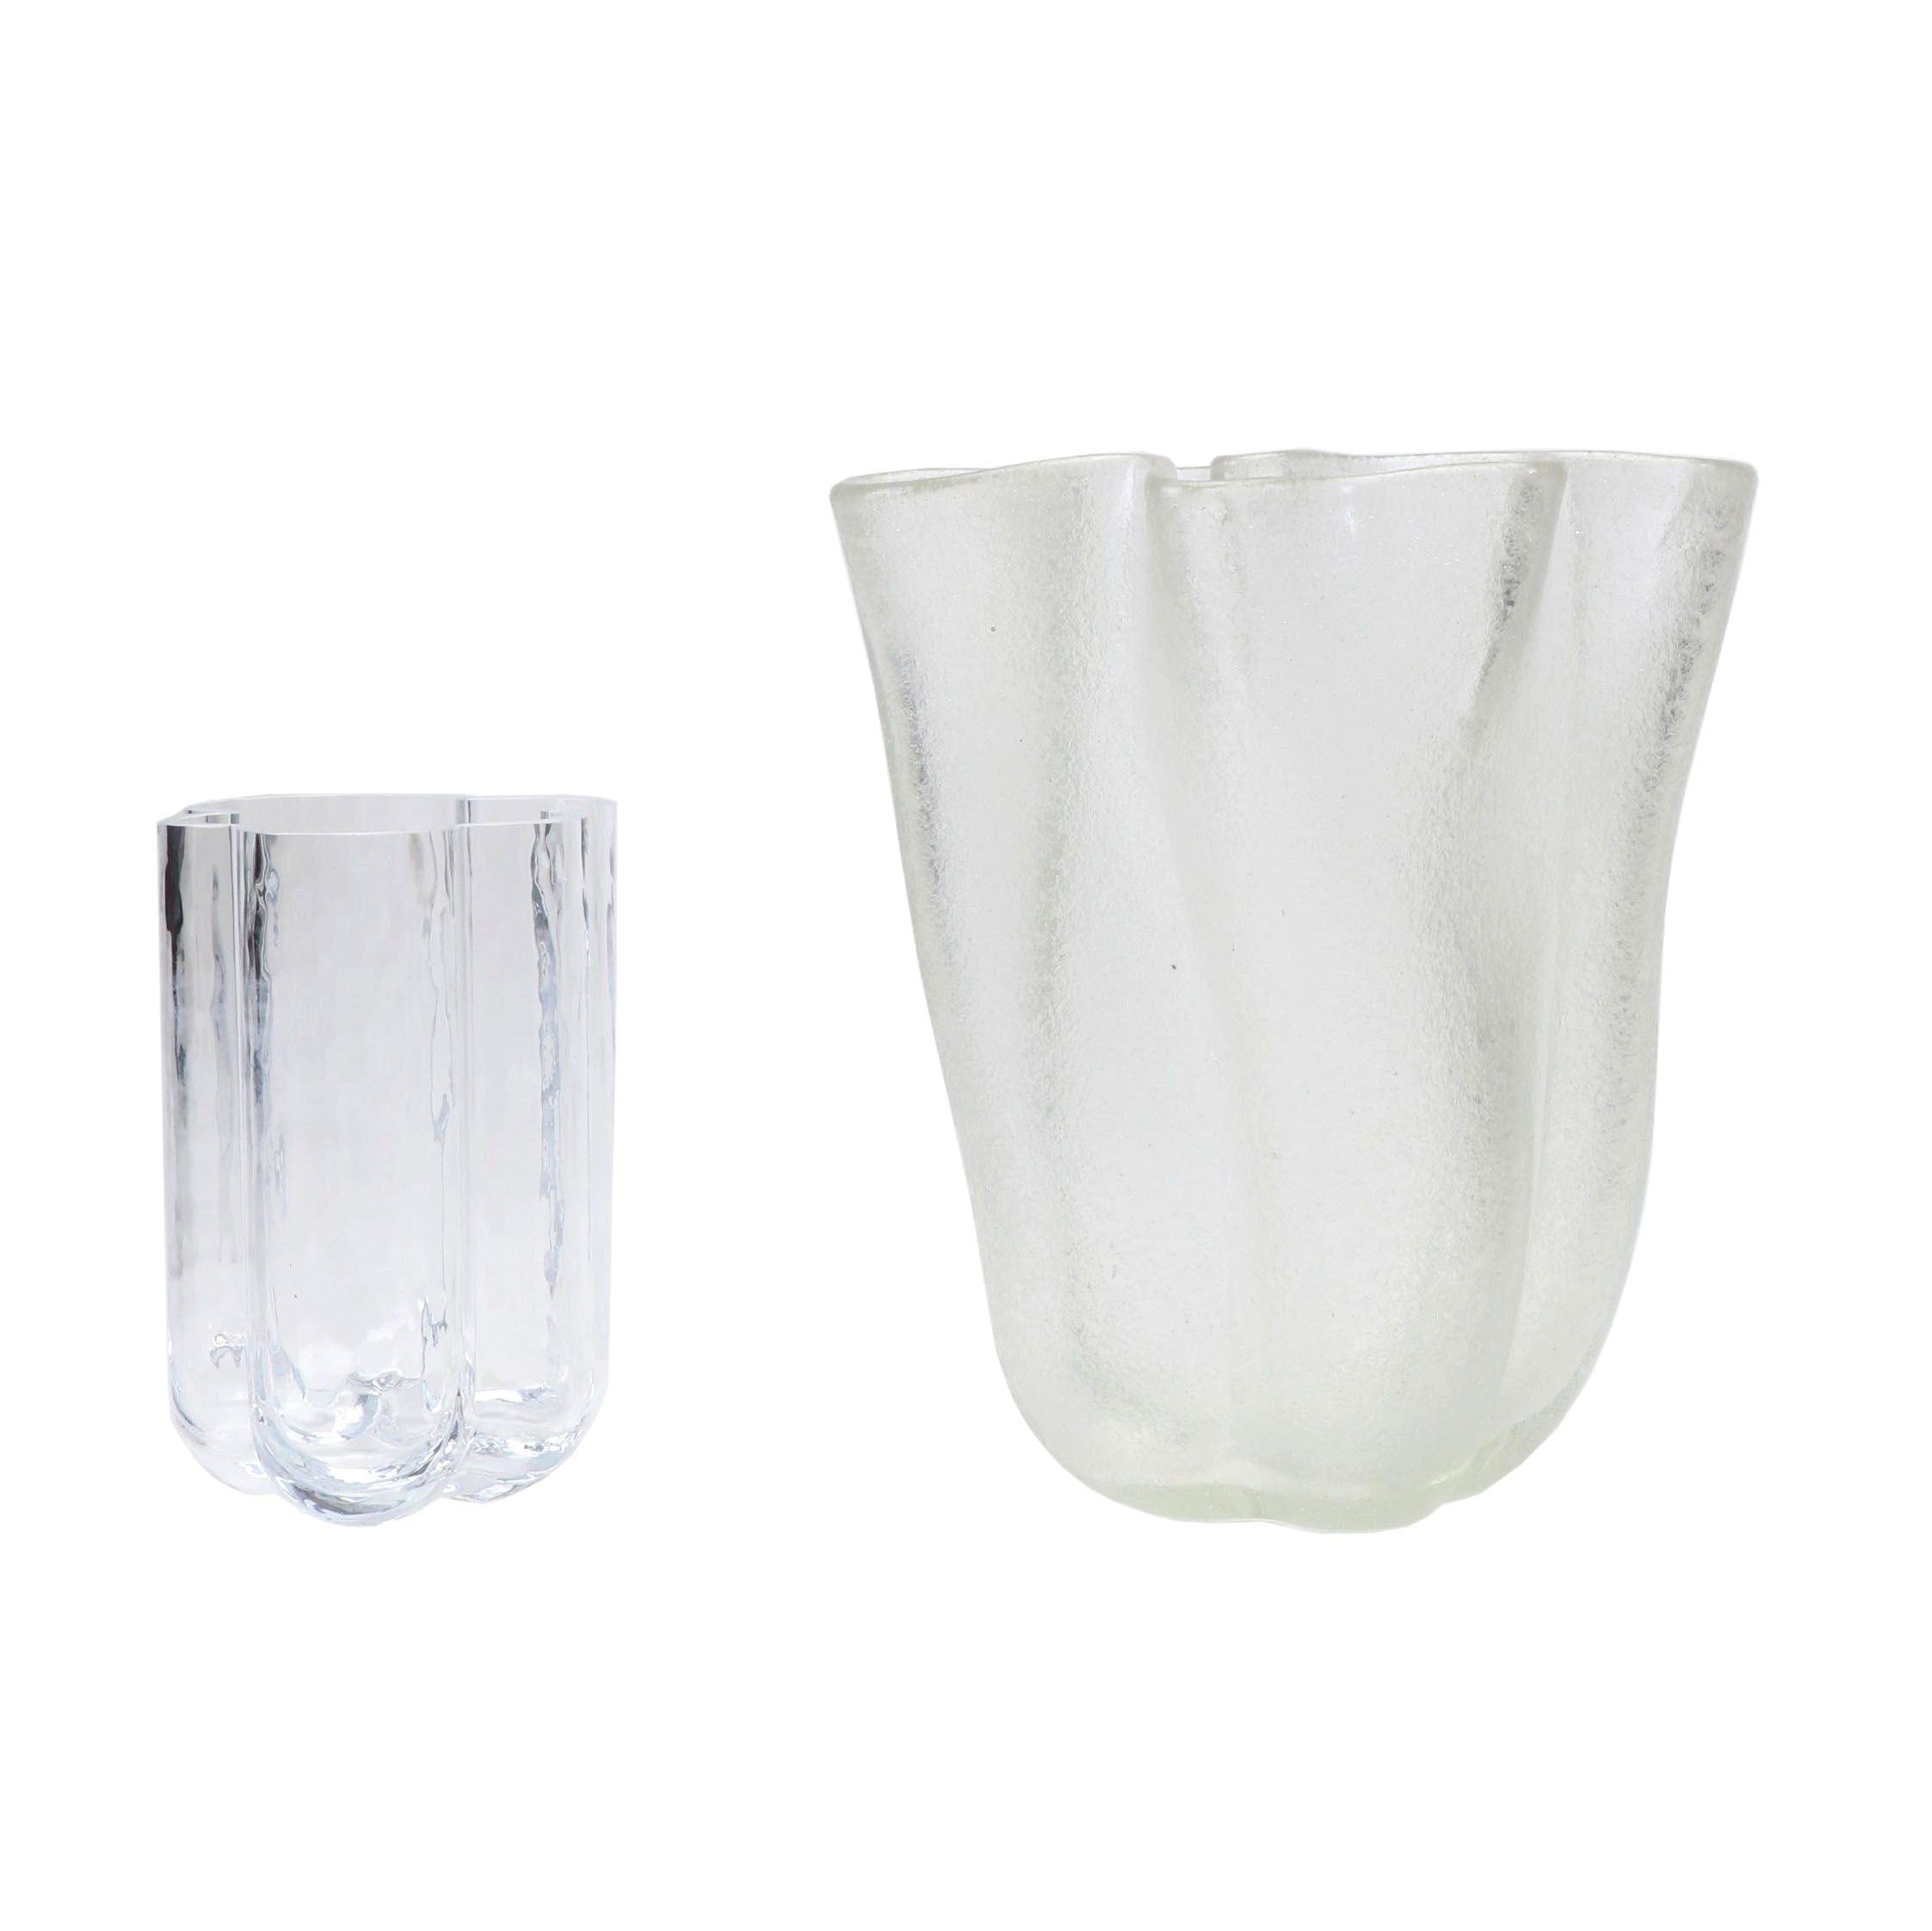 Mid Century Modern Distorted Glass Wavy Vases